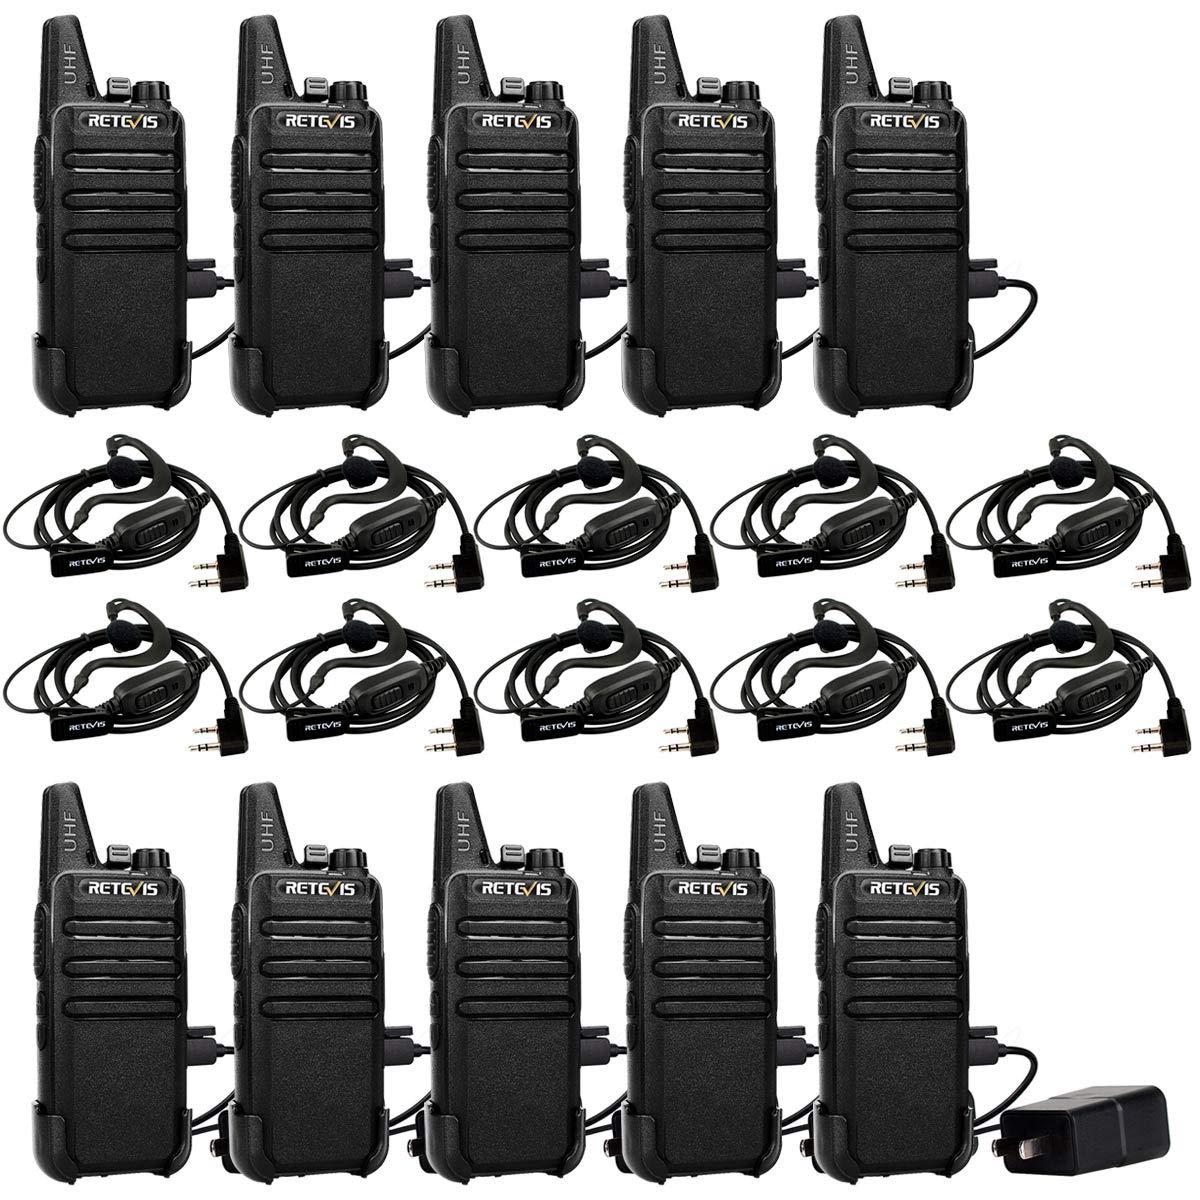 Retevis RT22 Walkie-Talkies FRS UHF 16 CH Vox Handsfree Emergency Alarm Channel Lock Mini 2 Way Radio Walkie Talkies with Earpieces Headset(10 Pack) by Retevis